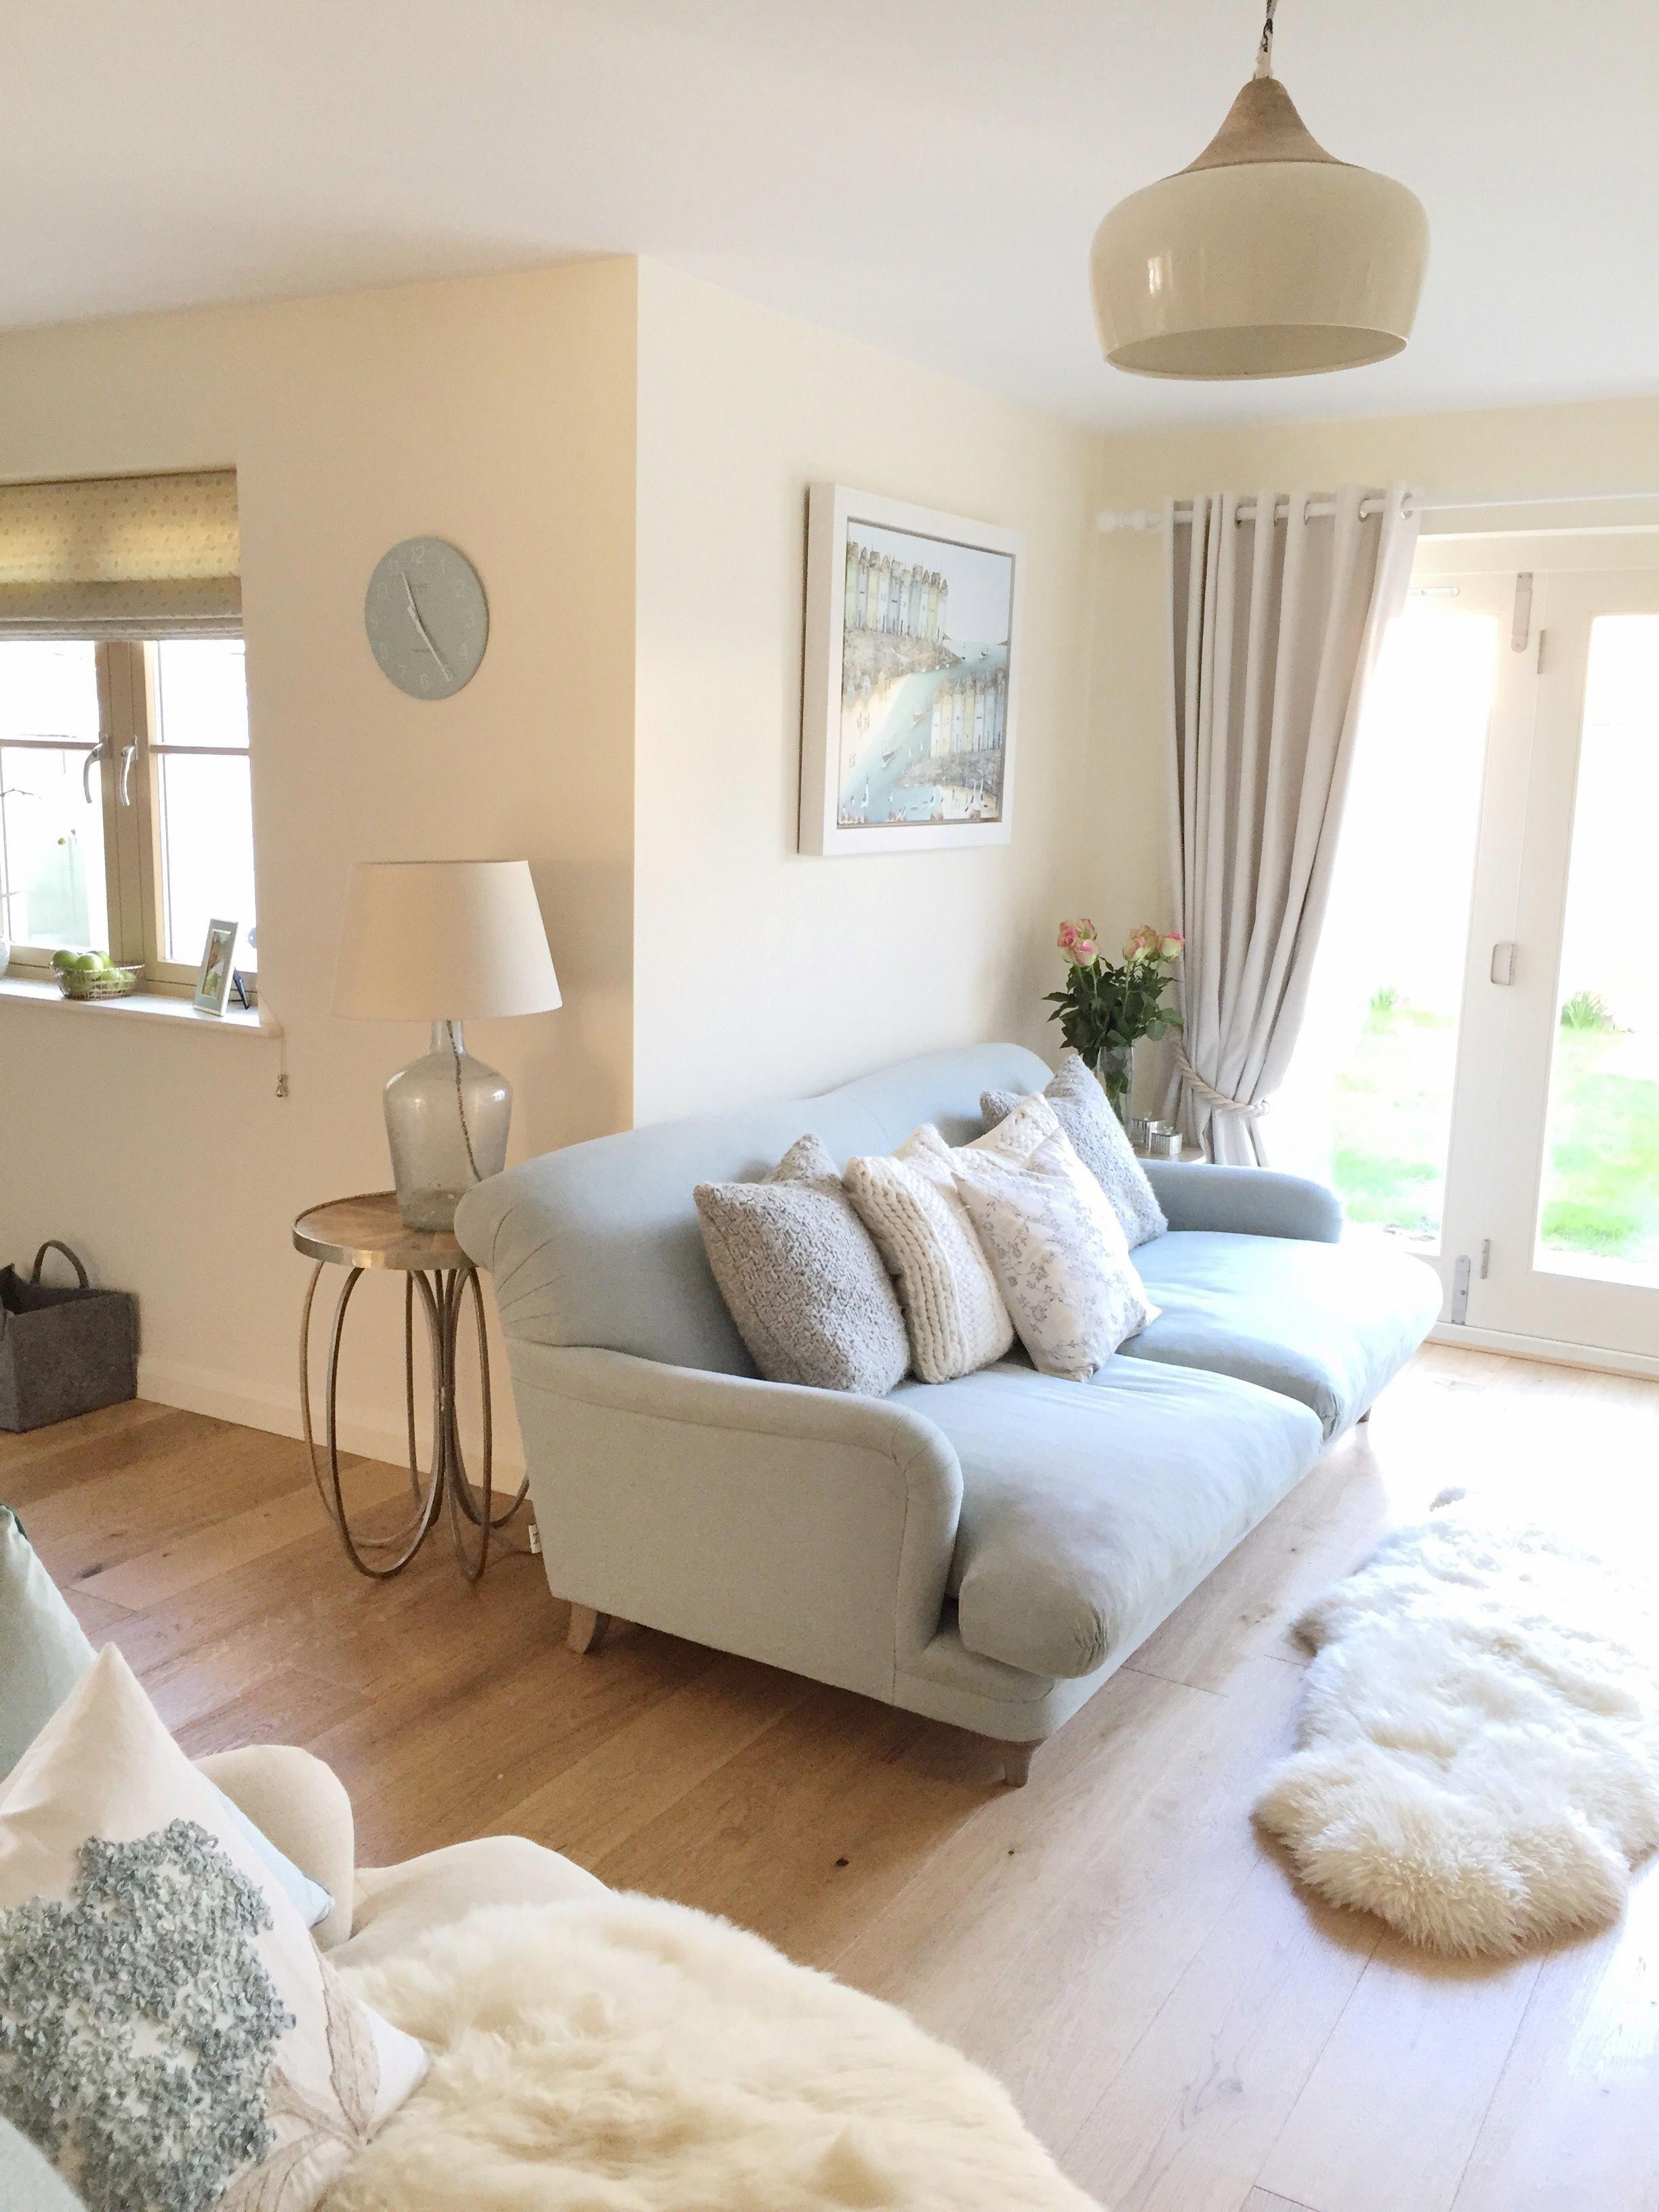 Coastal Lounge With Duck Egg And Cream Loaf Sofa Coastallivingrooms Cream Living Room Decor Blue And Cream Living Room Cream Living Rooms